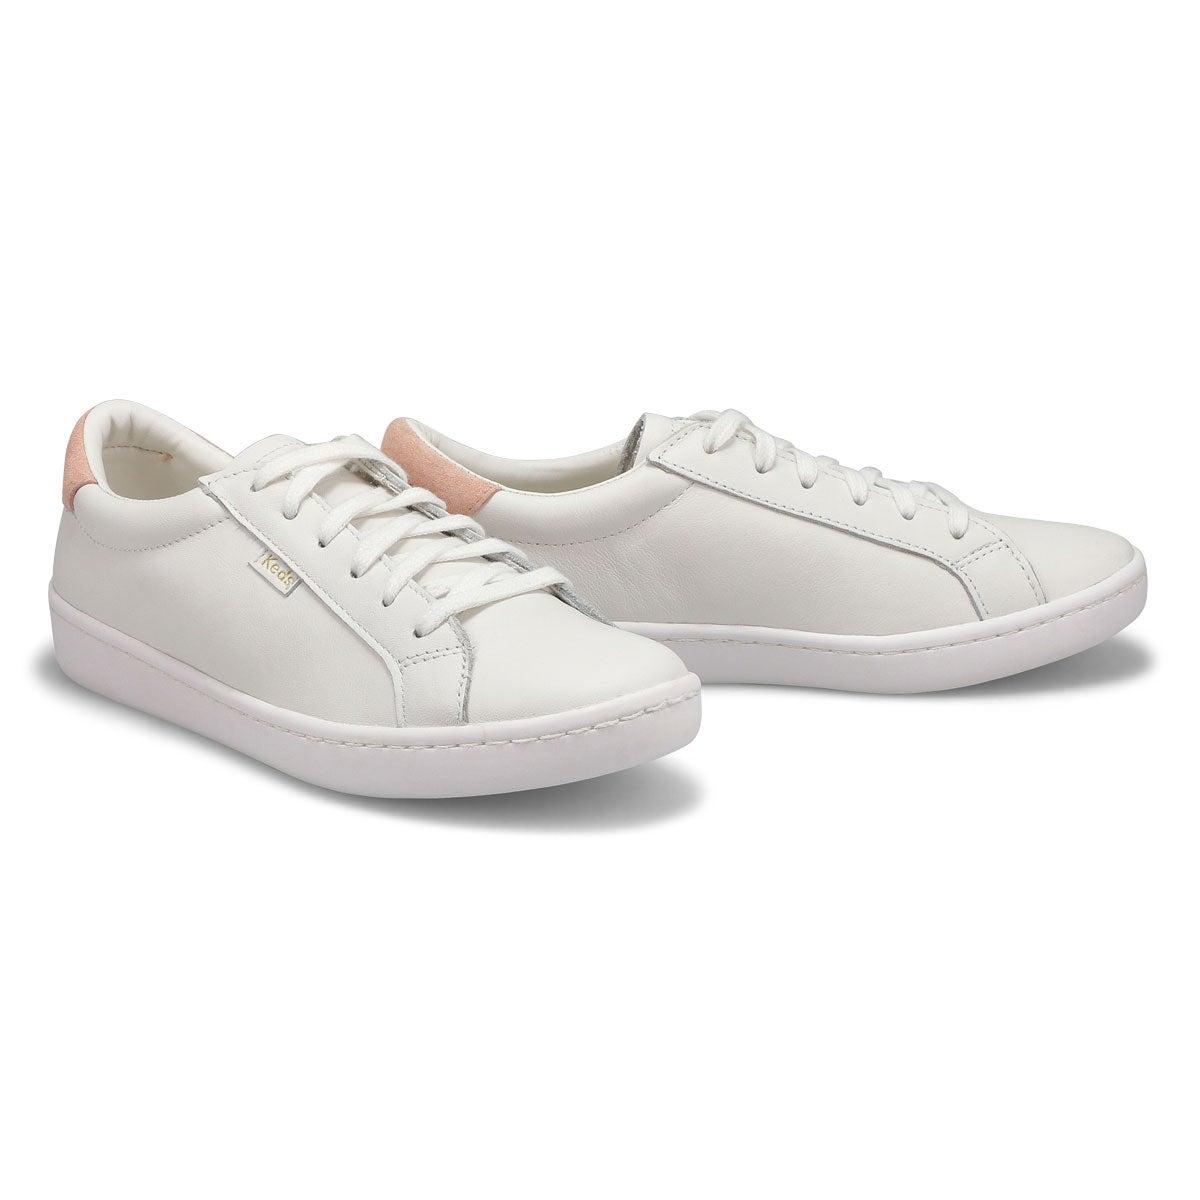 Keds Keds Keds Women's Ace Leather Fashion Sneaker 49b39d